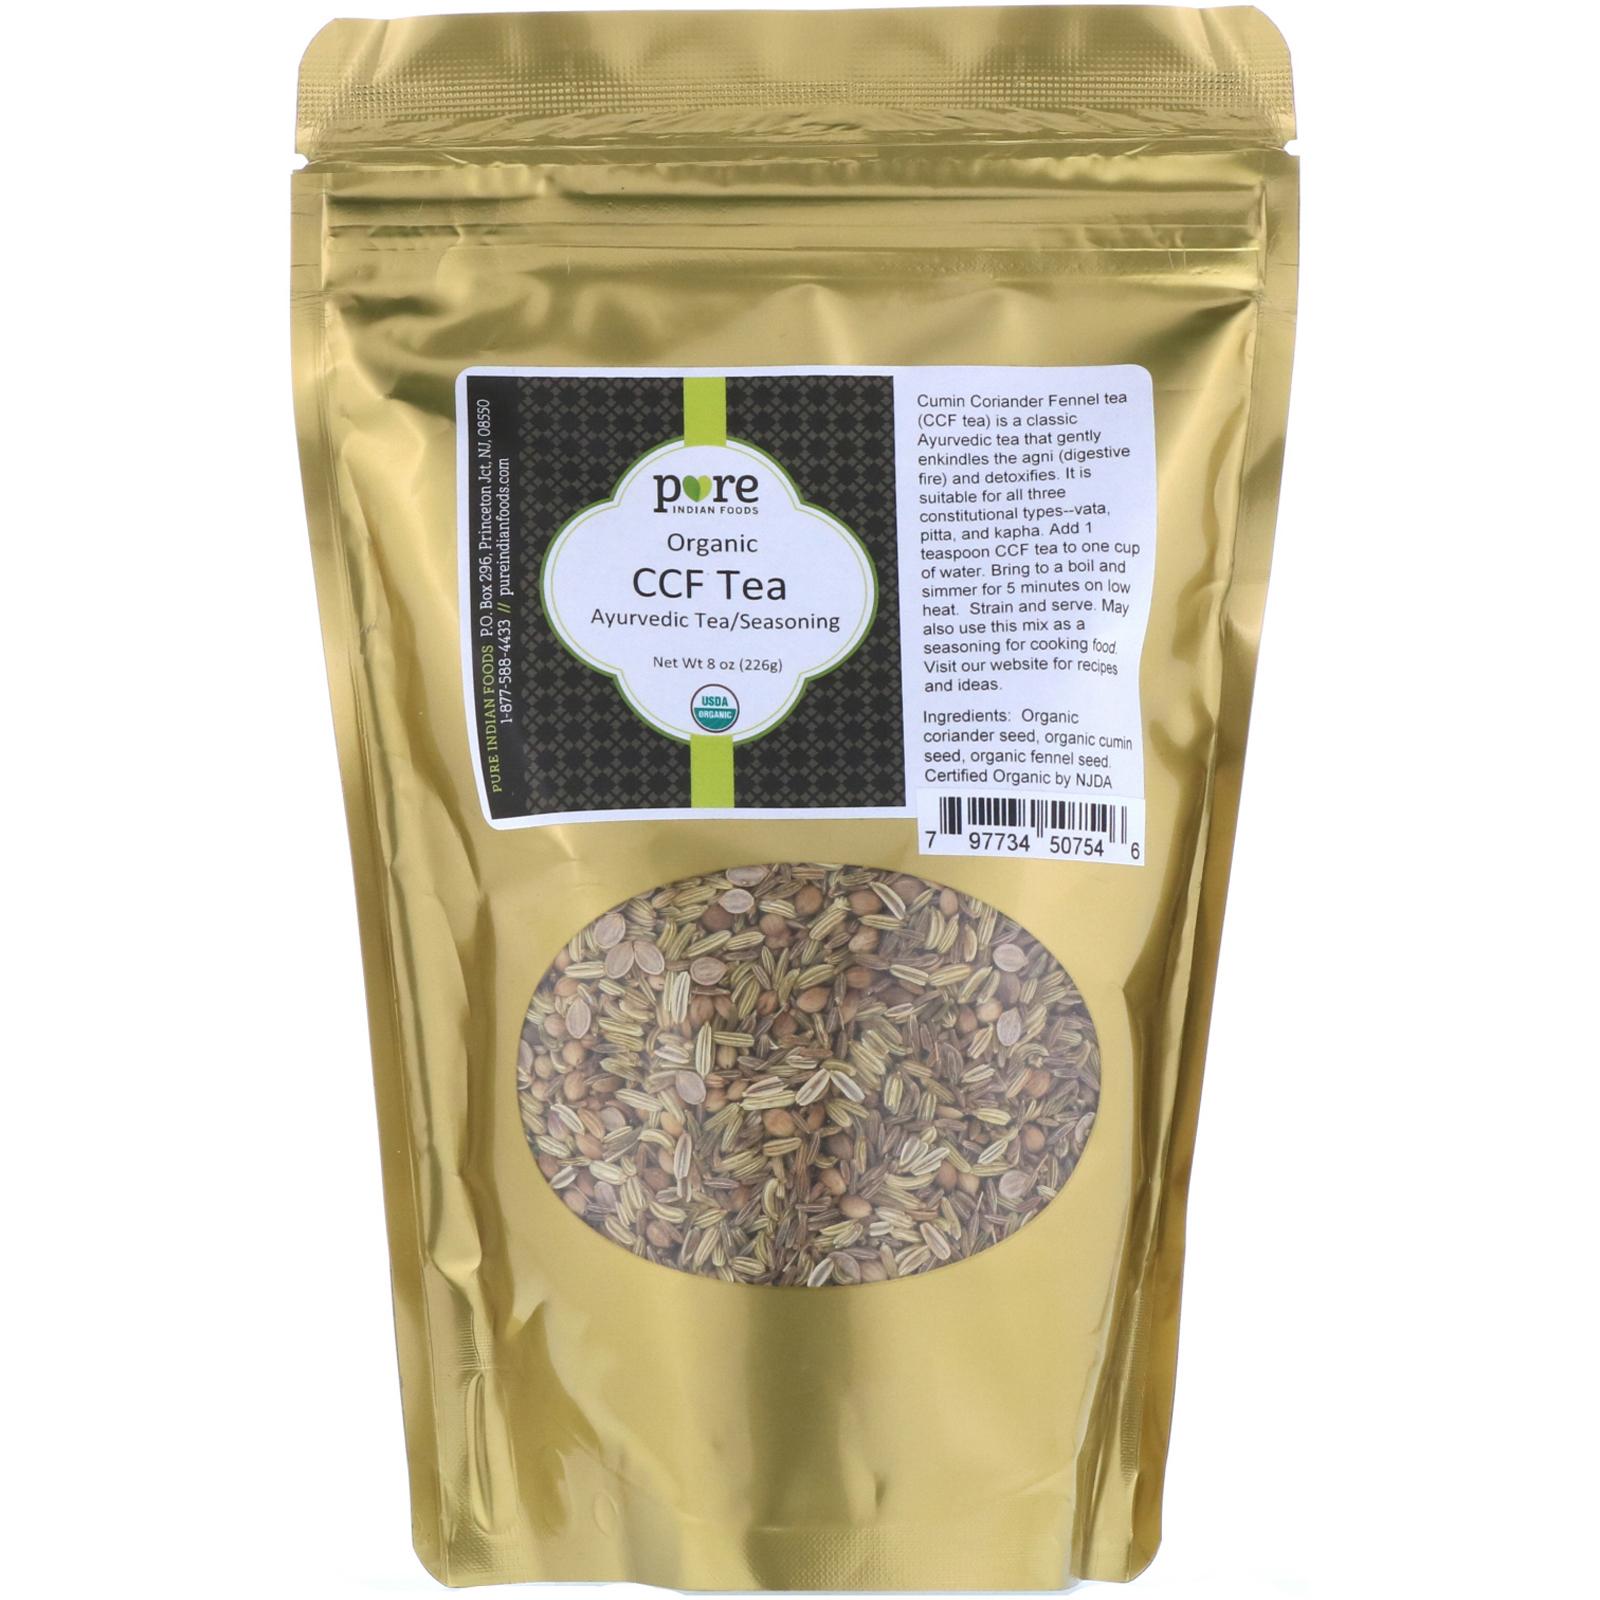 Pure Indian Foods, Organic CCF Tea, Ayurvedic Tea/Seasoning, 8 oz (226 g)